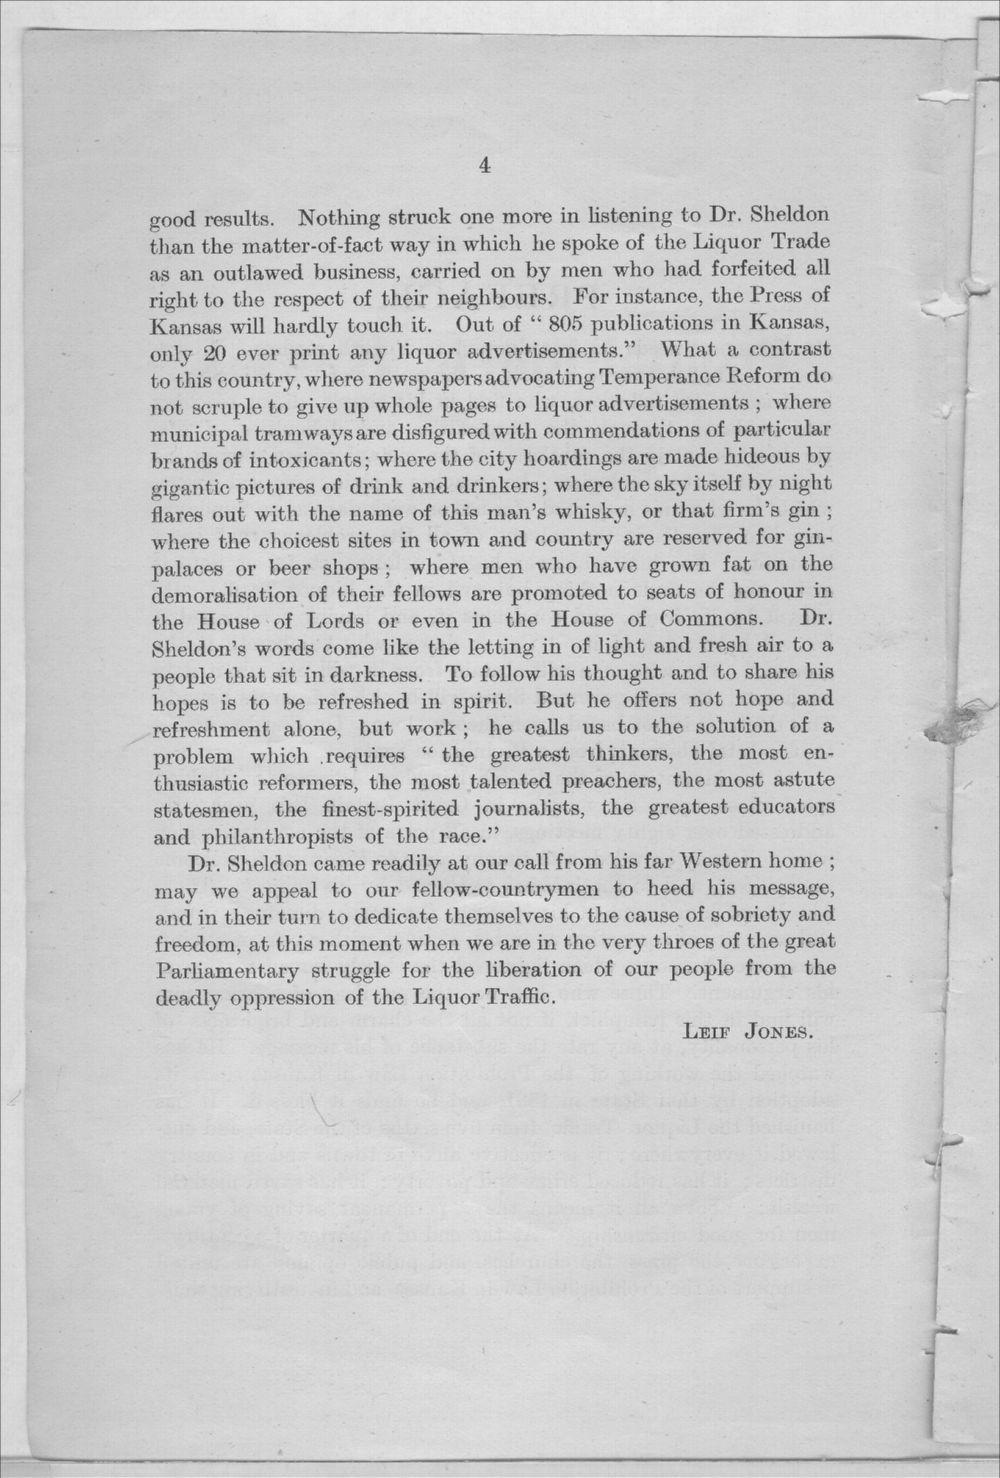 Prohibition in Kansas, U.S.A. - 4